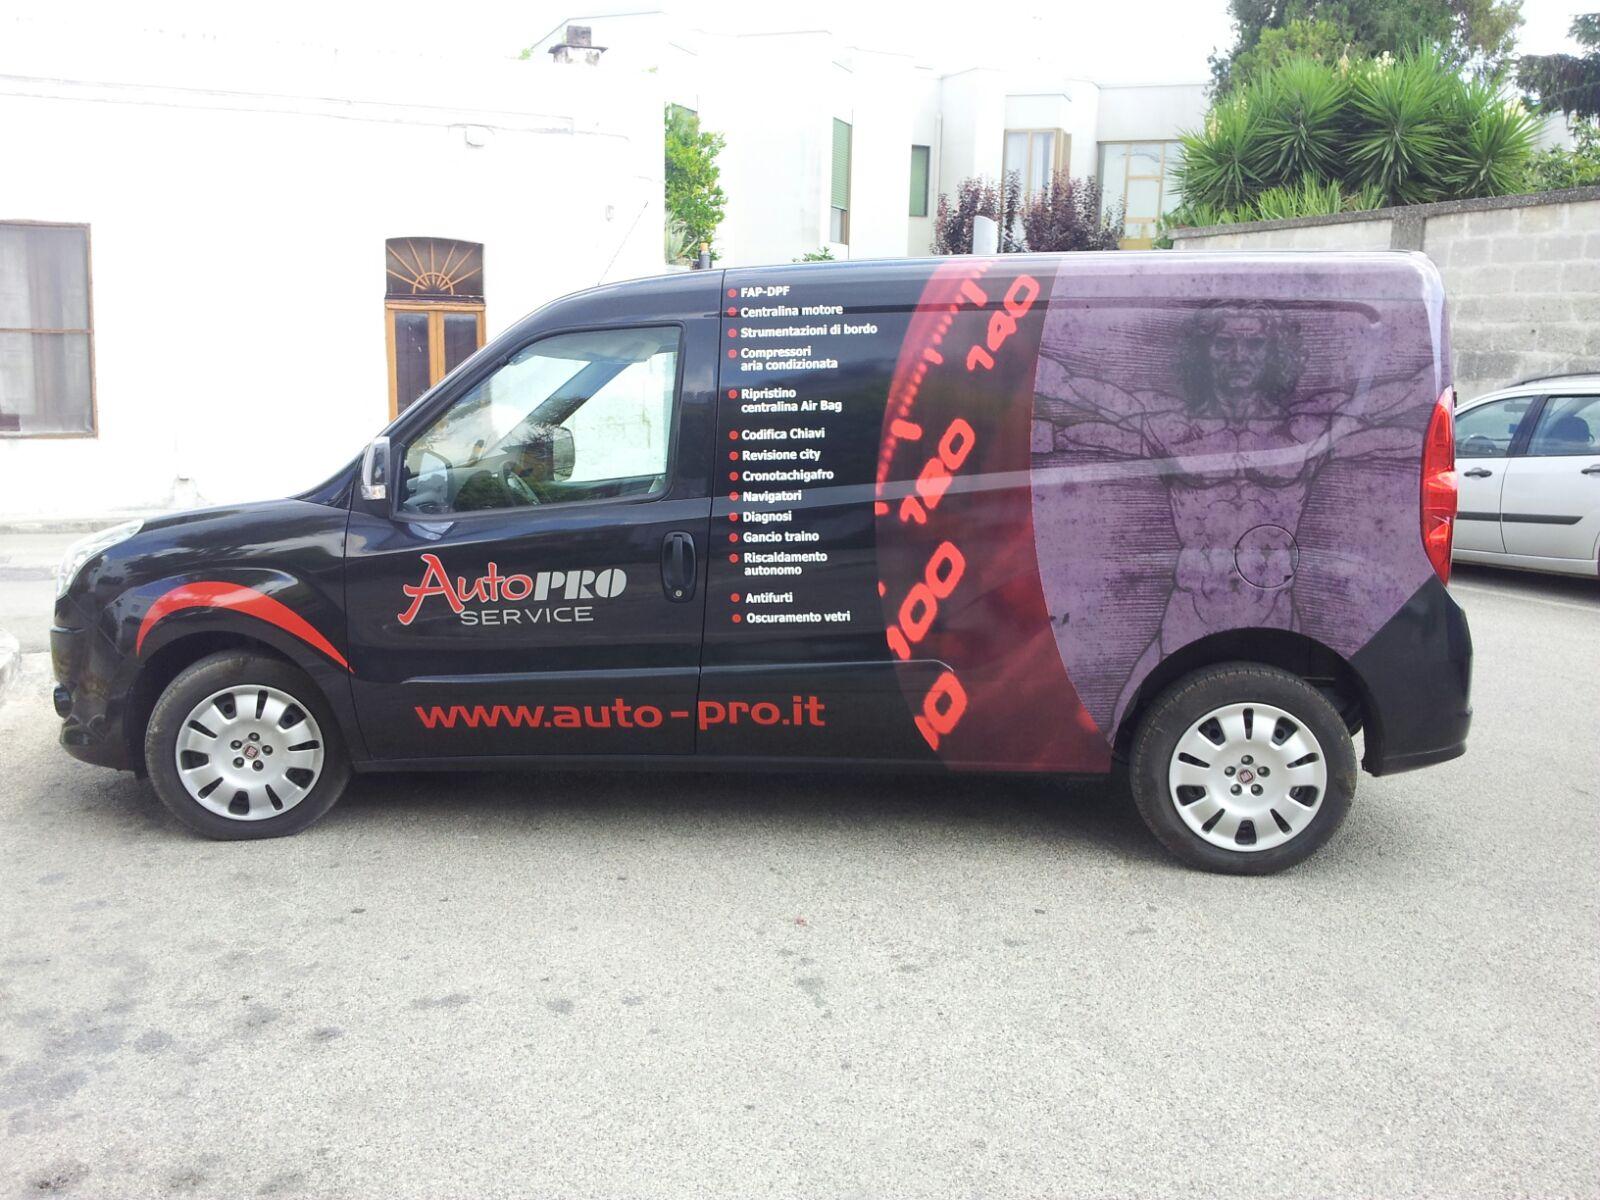 Emmegrafica Minivan Allestimento laterale sx